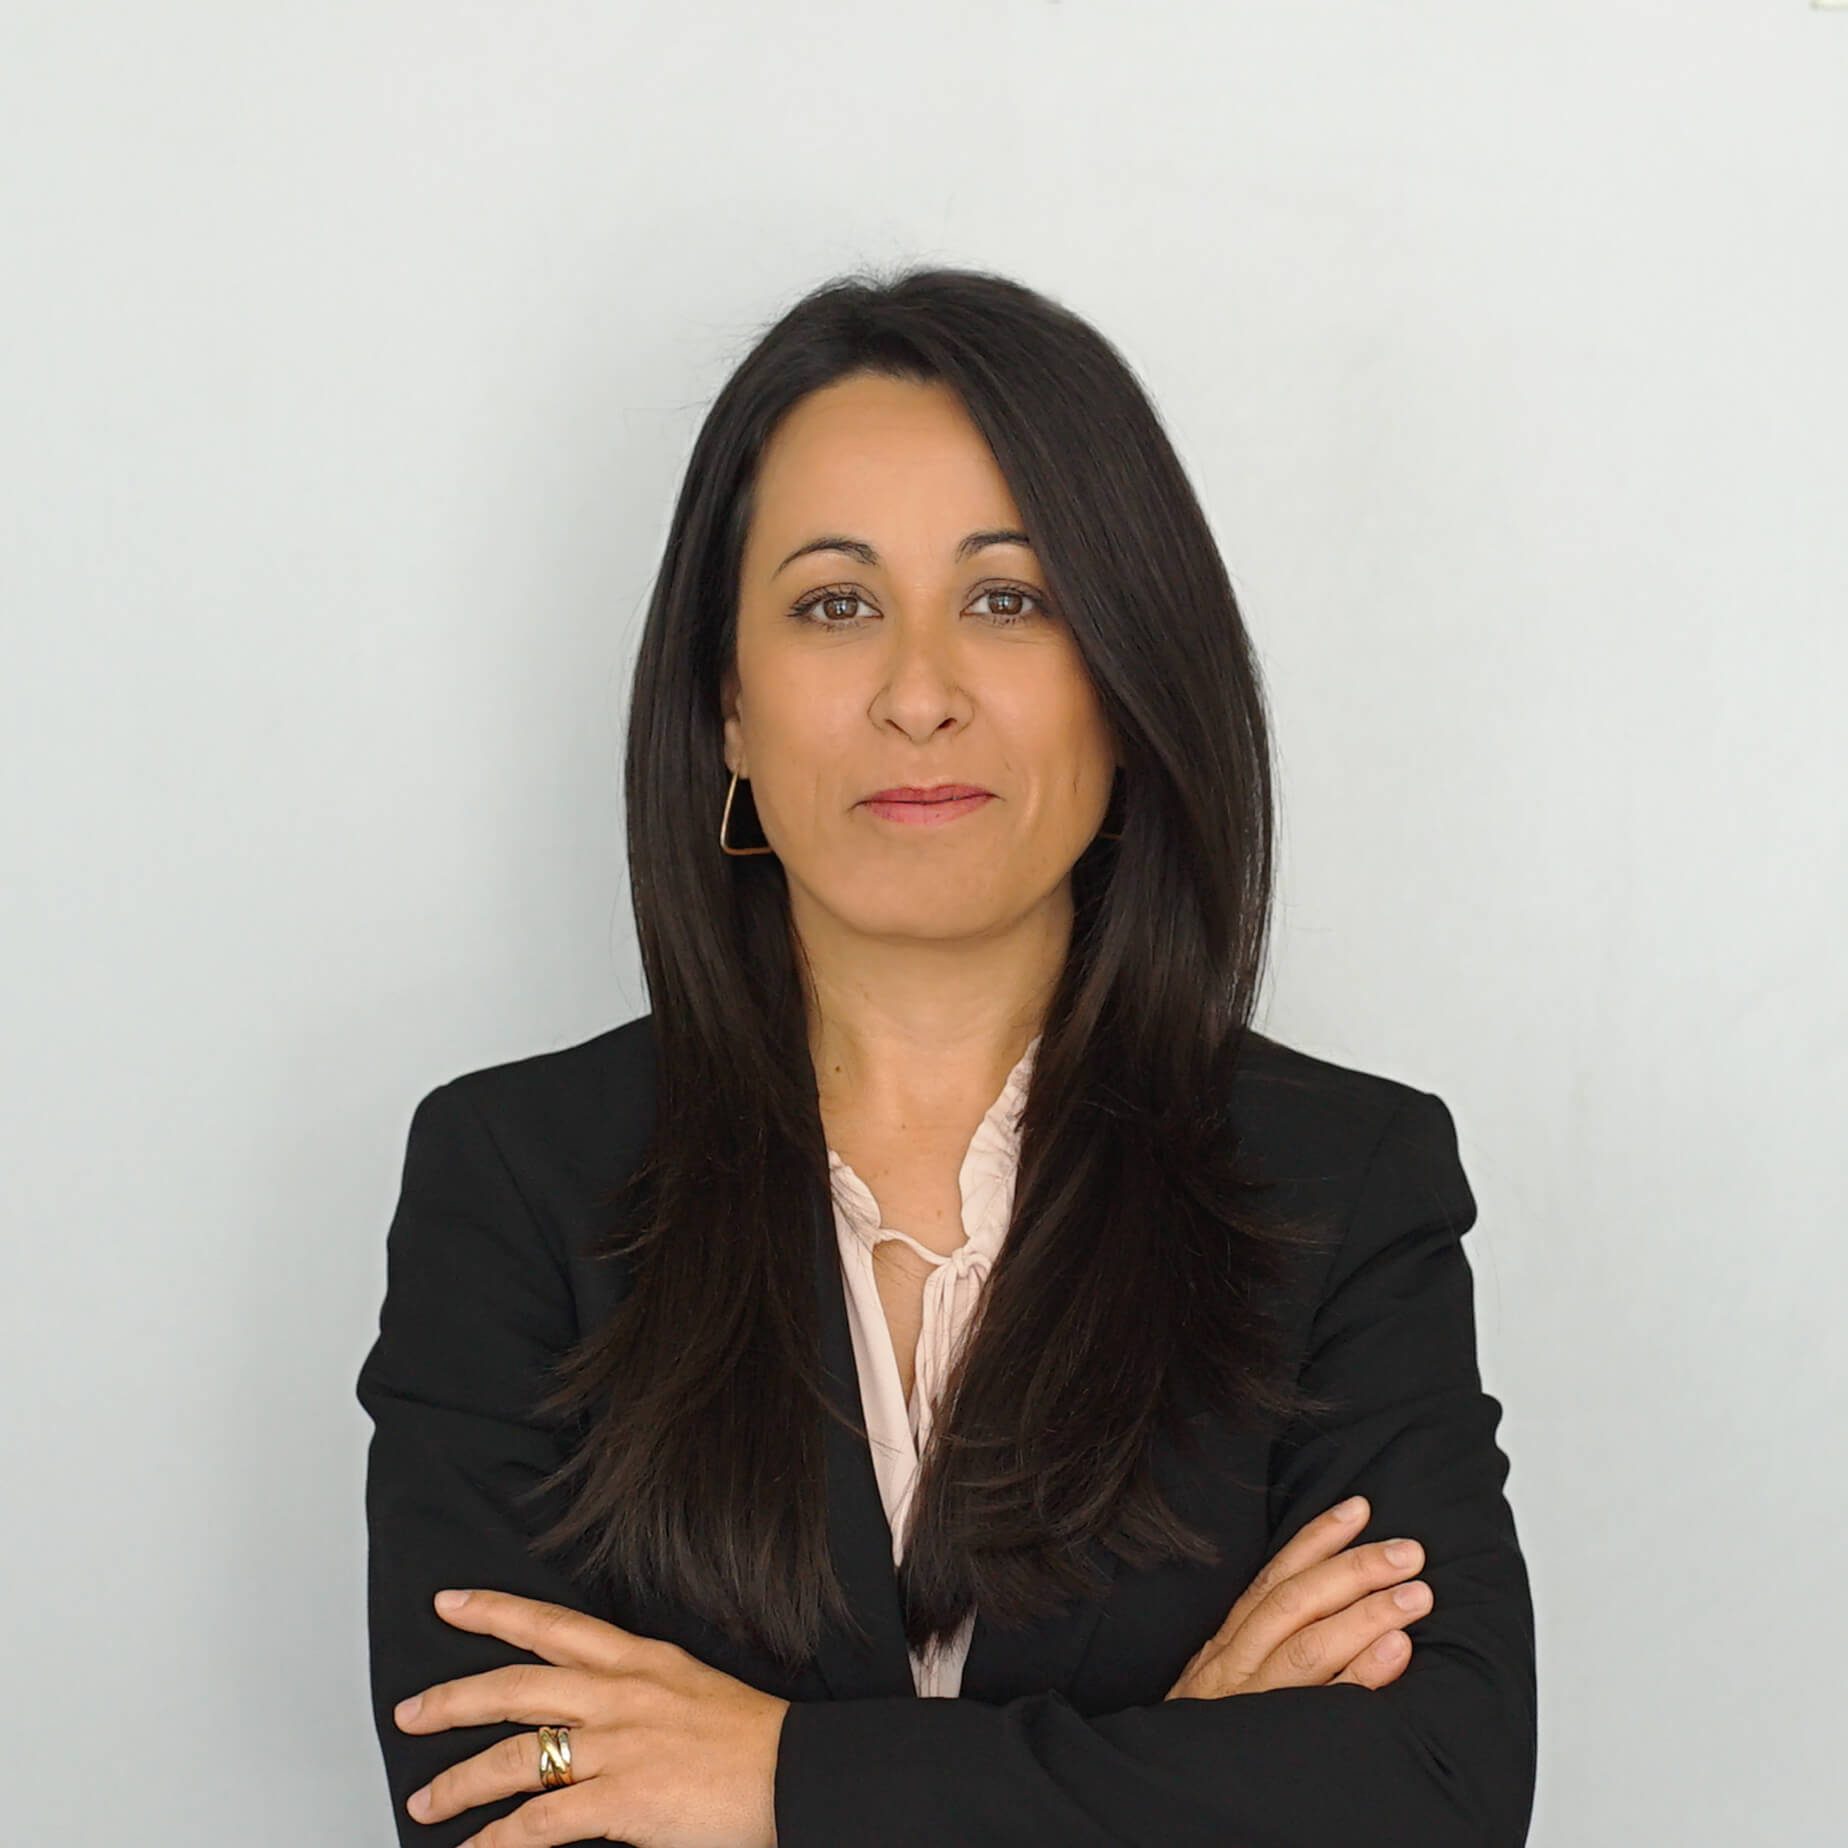 Natália Cunha - Business Unit Director @ IT People Innovation